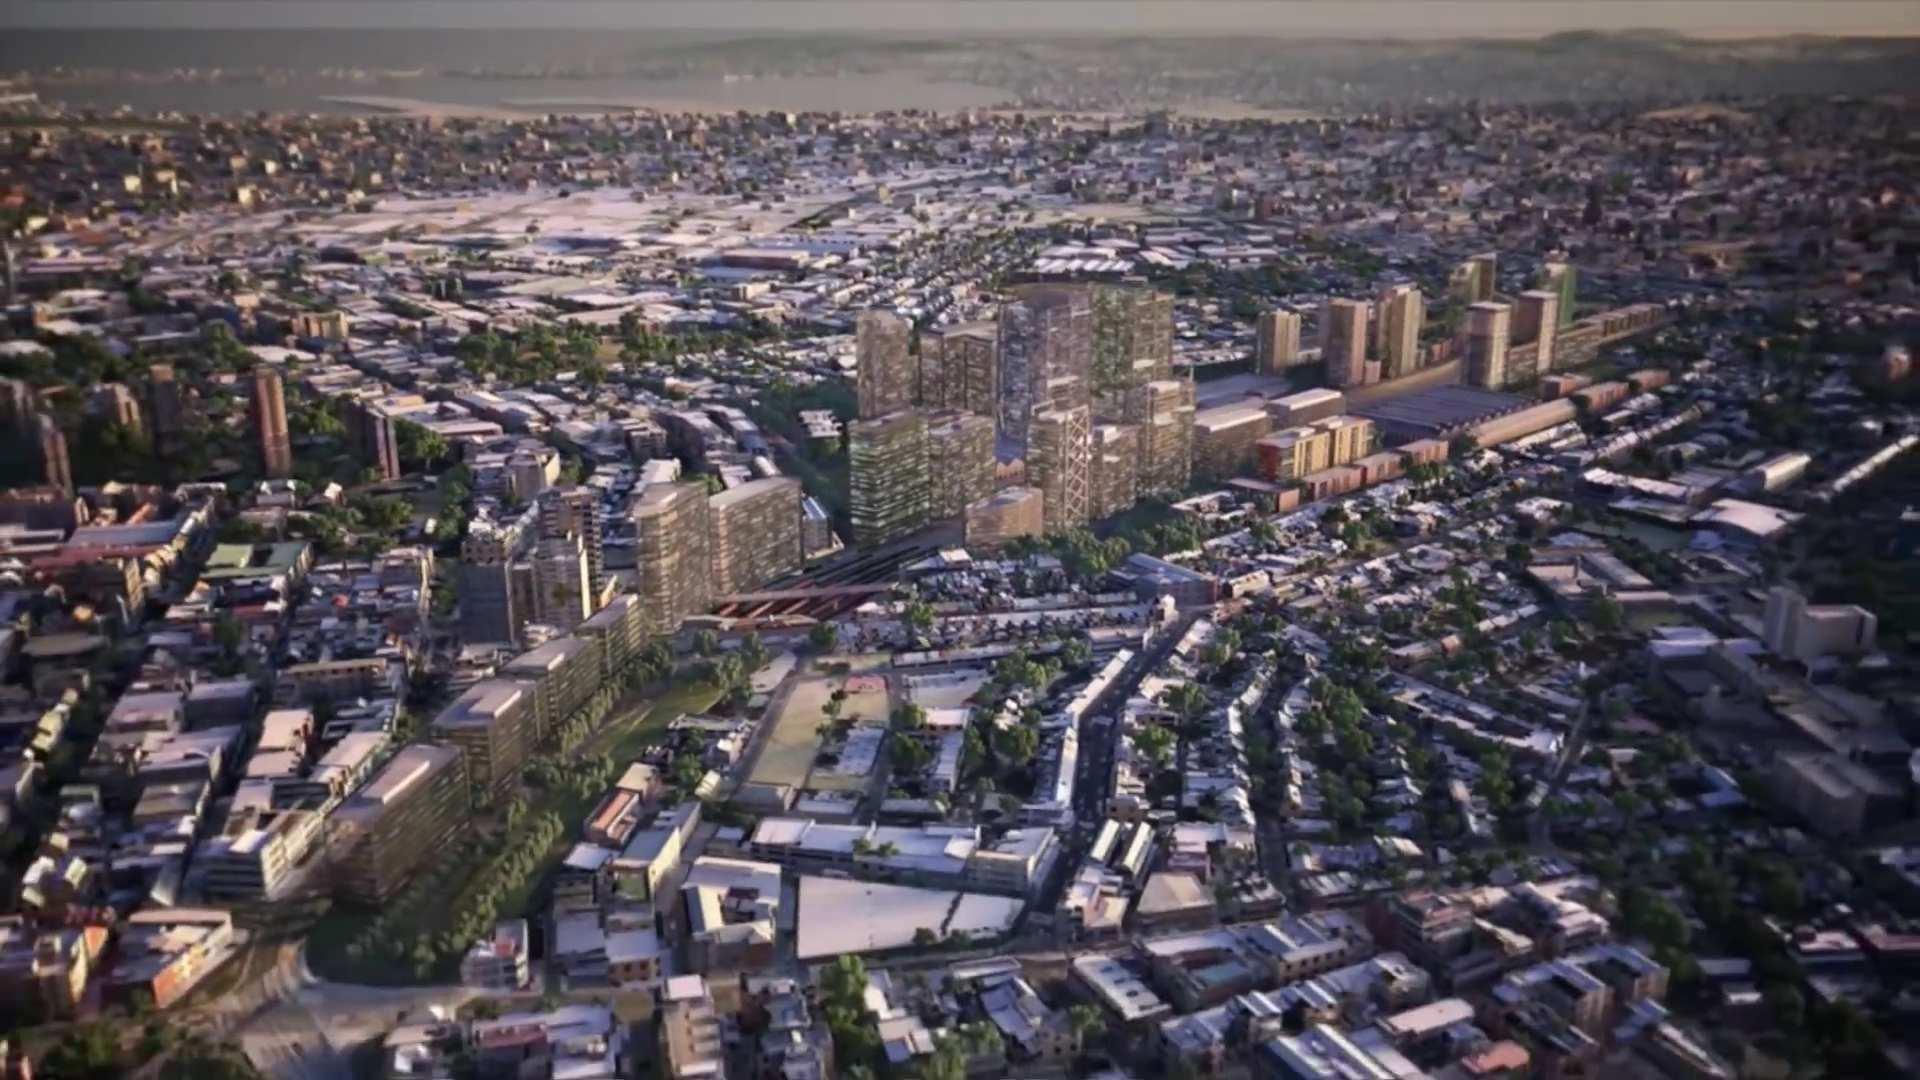 Indicative Development Lawson St to Cleveland Street